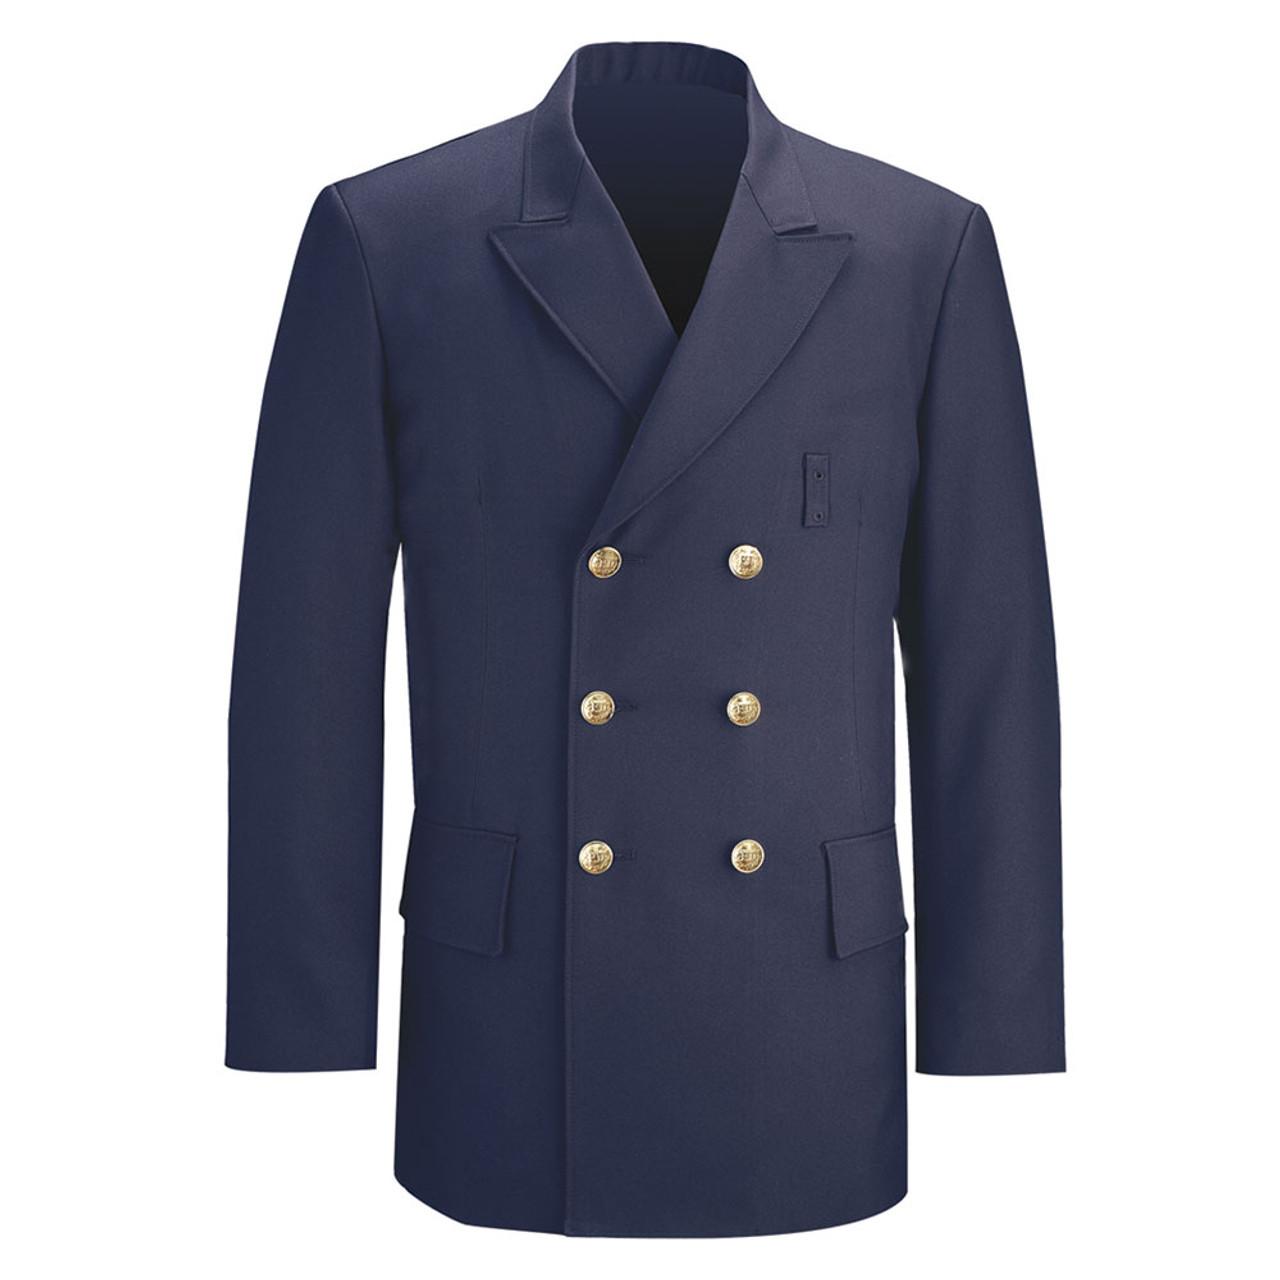 Fechheimer 38804 Double Breasted Blouse Coat Atlantic Tactical Inc